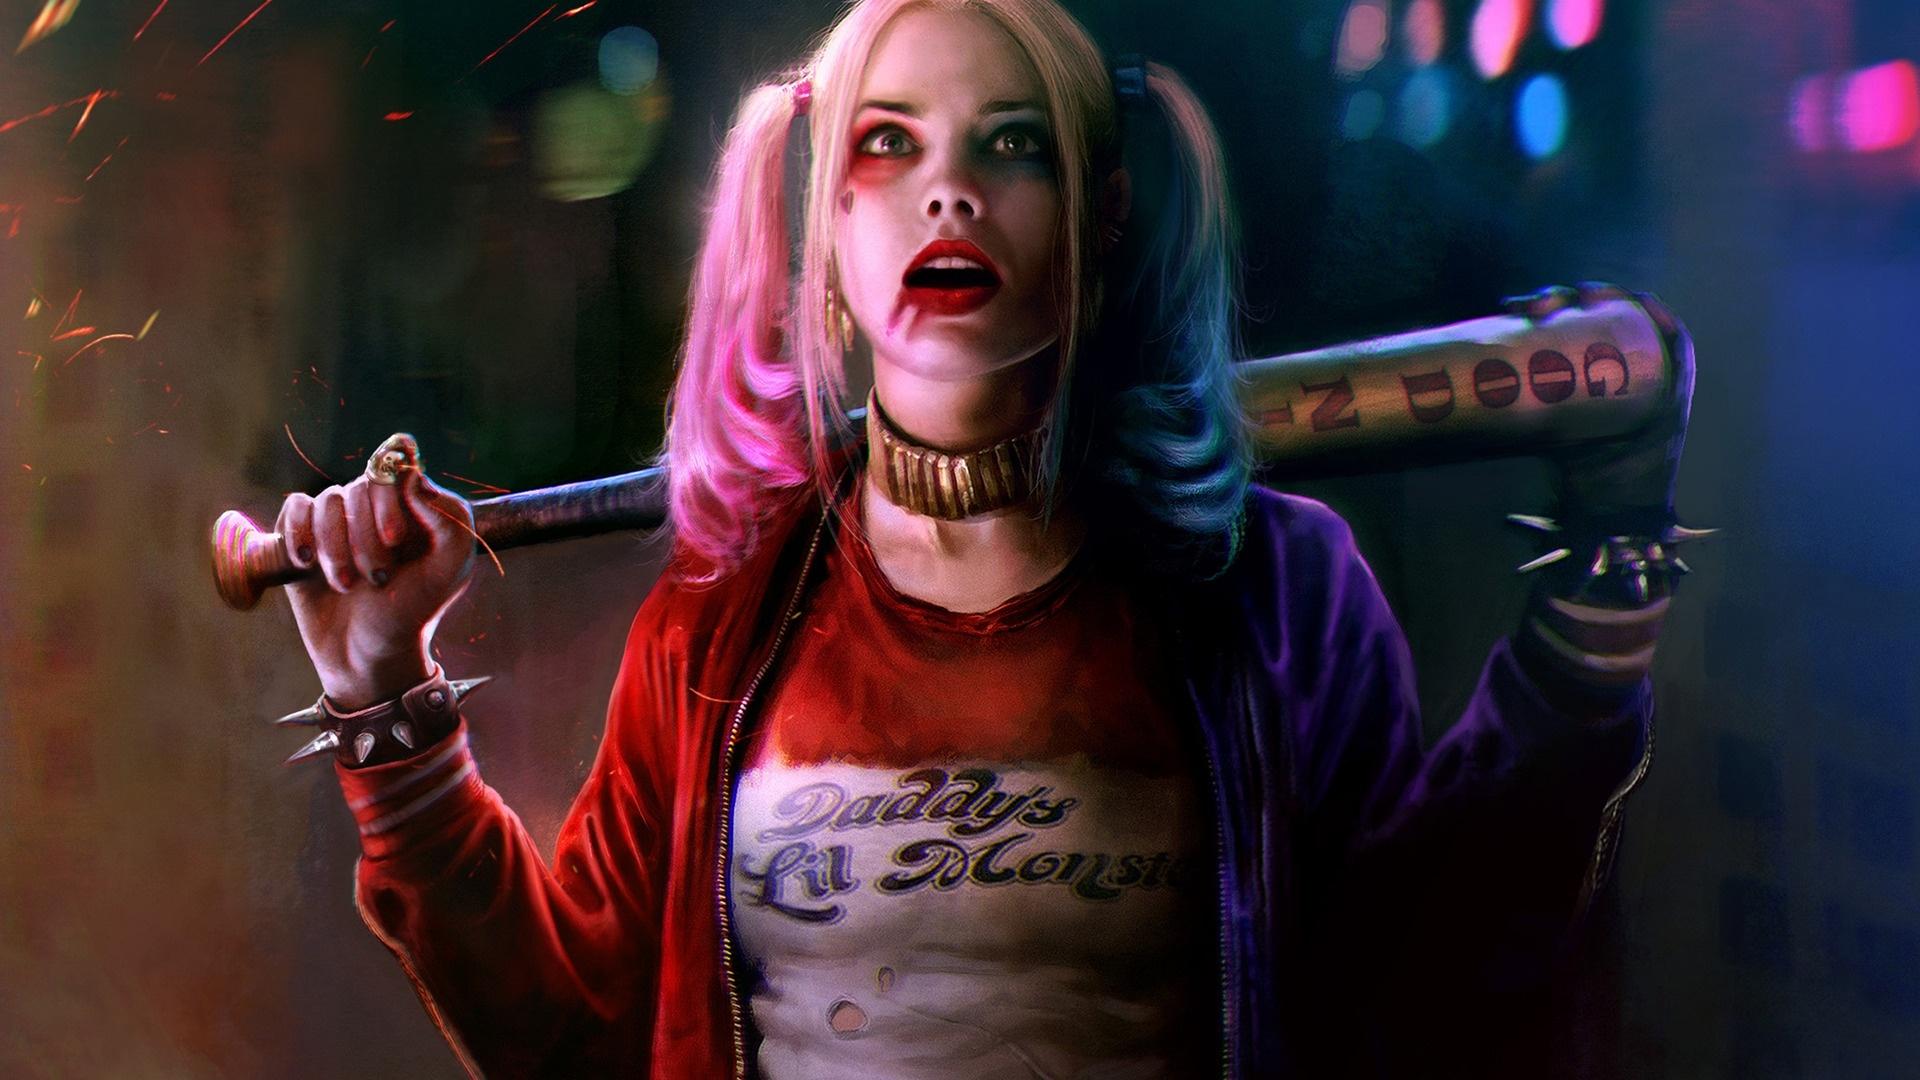 Harley Quinn windows wallpaper